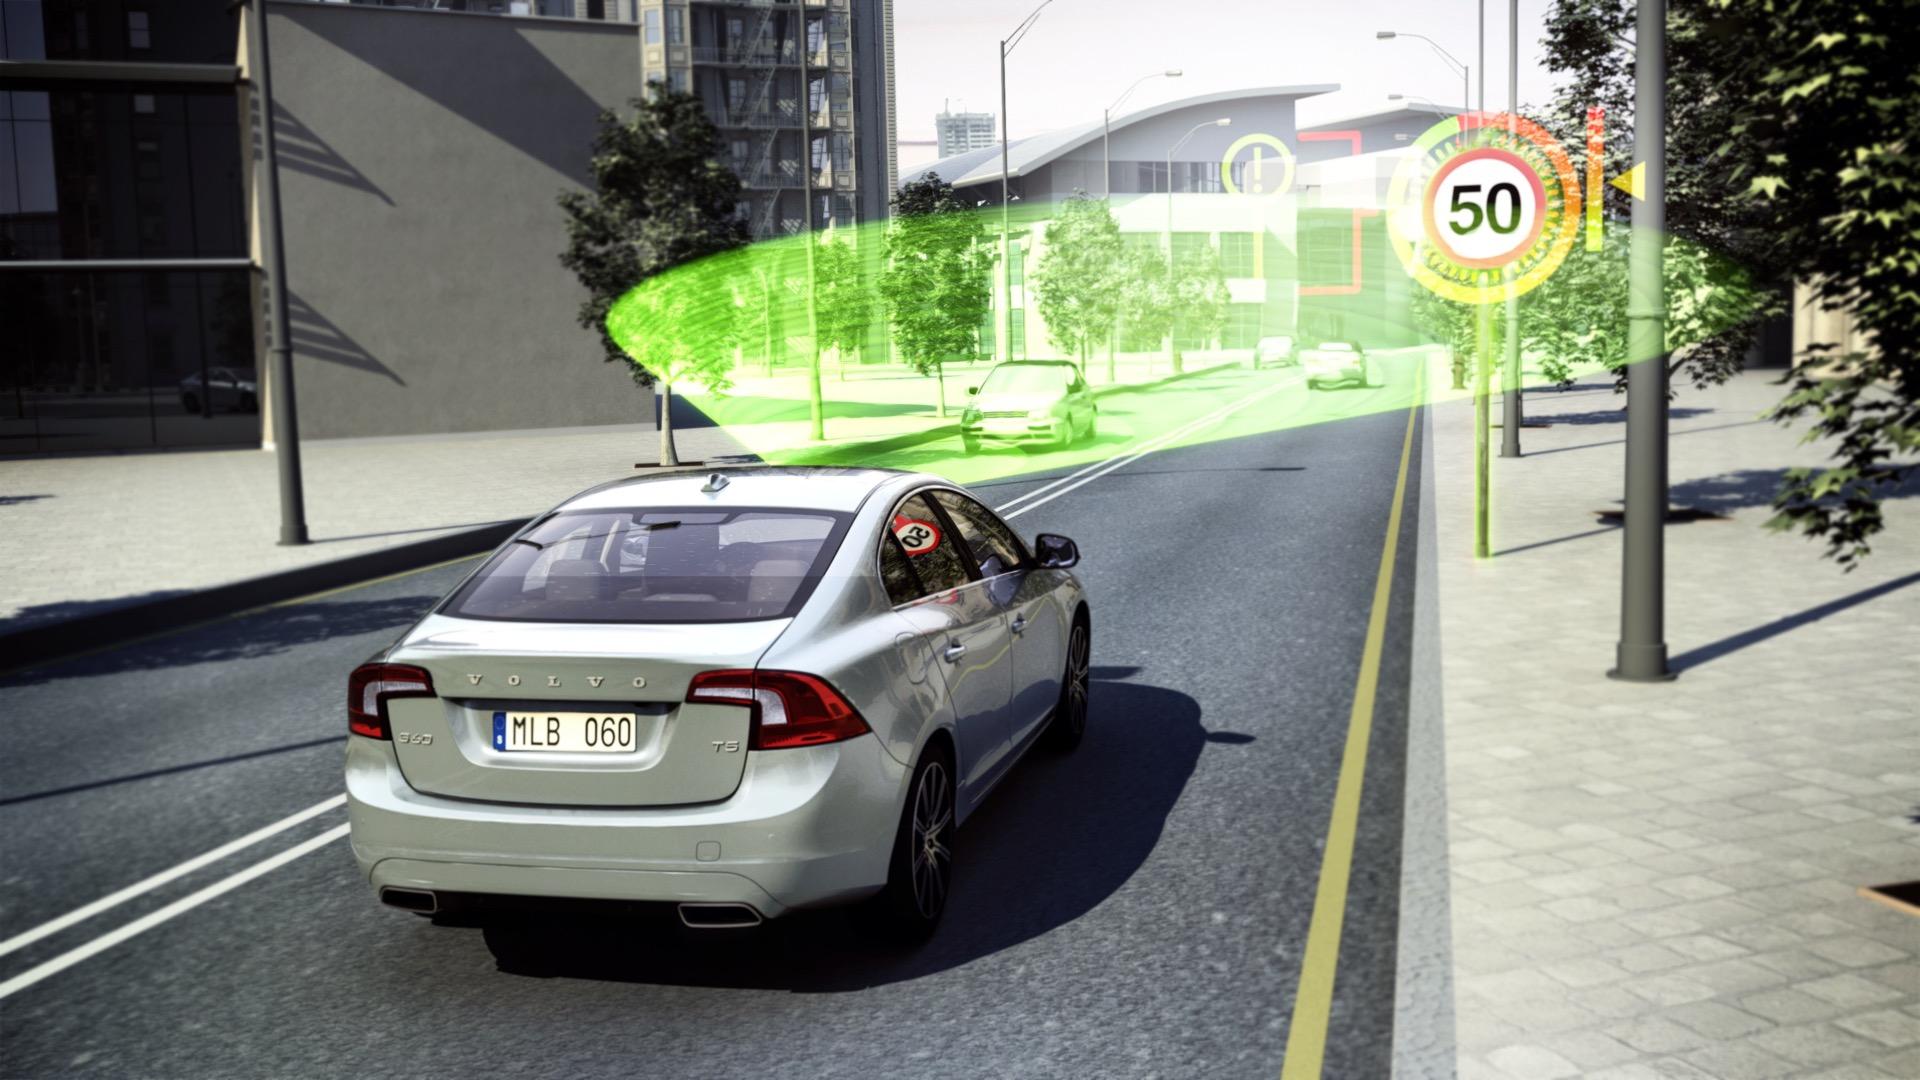 Road Sign Information -  2013, 2014, Images, S60, S80, Safety, Technology, V40, V60, V70, Volvo, XC60, XC70